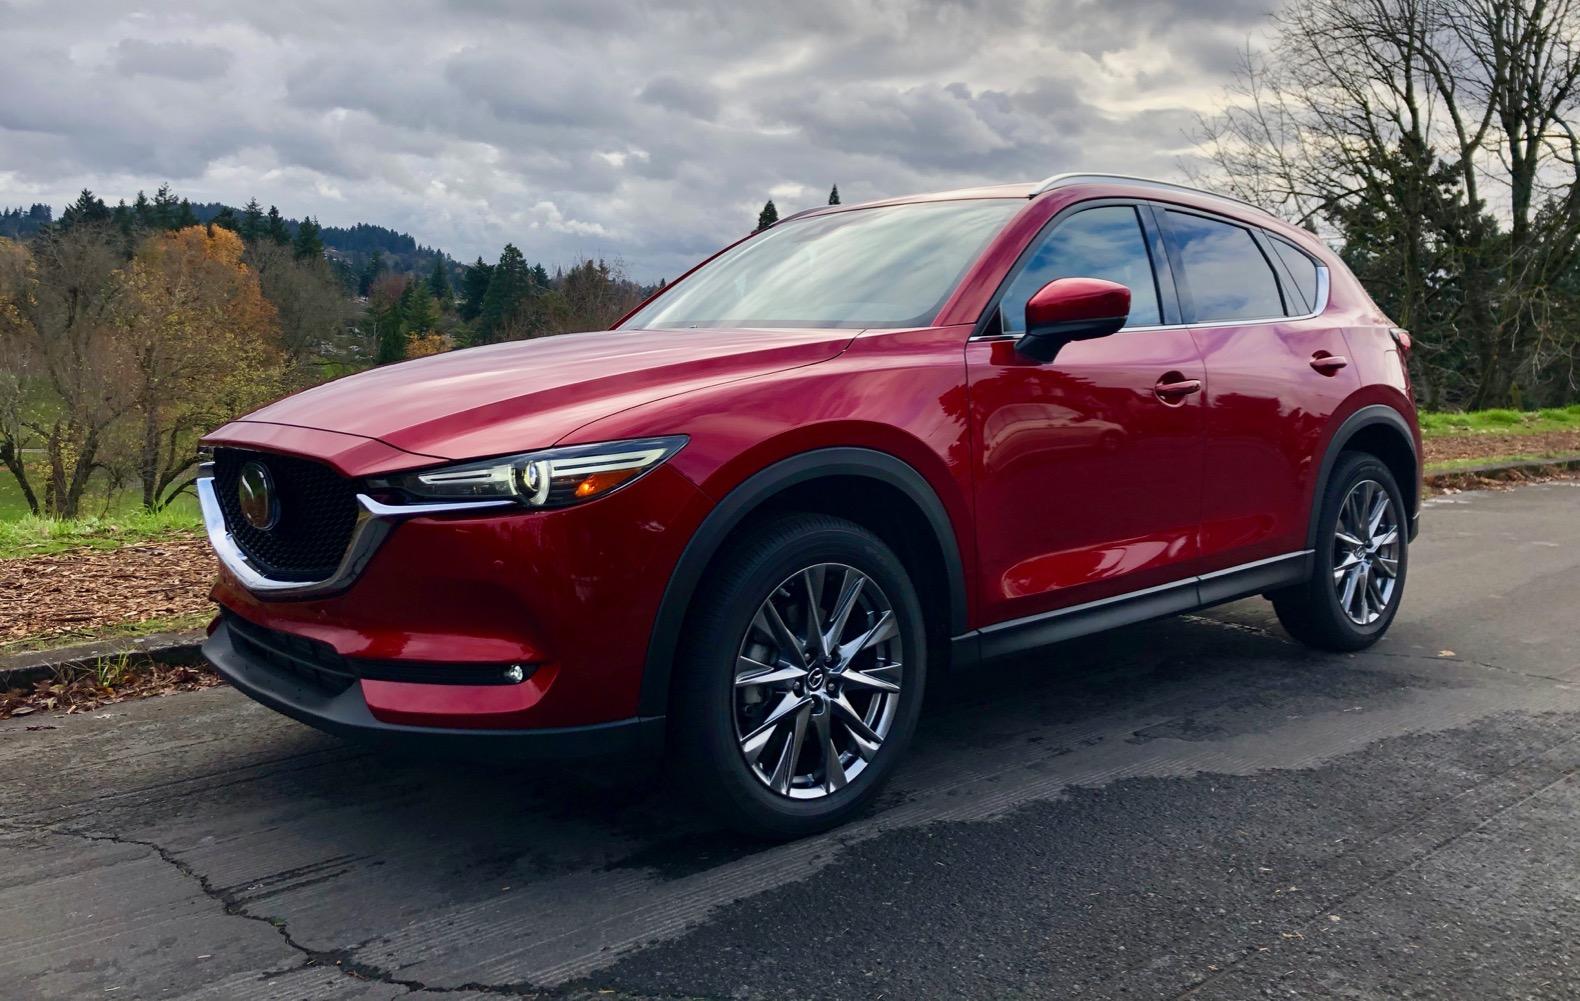 2019 mazda cx 5 signature review practical and pretty the torque report 2019 mazda cx 5 signature review